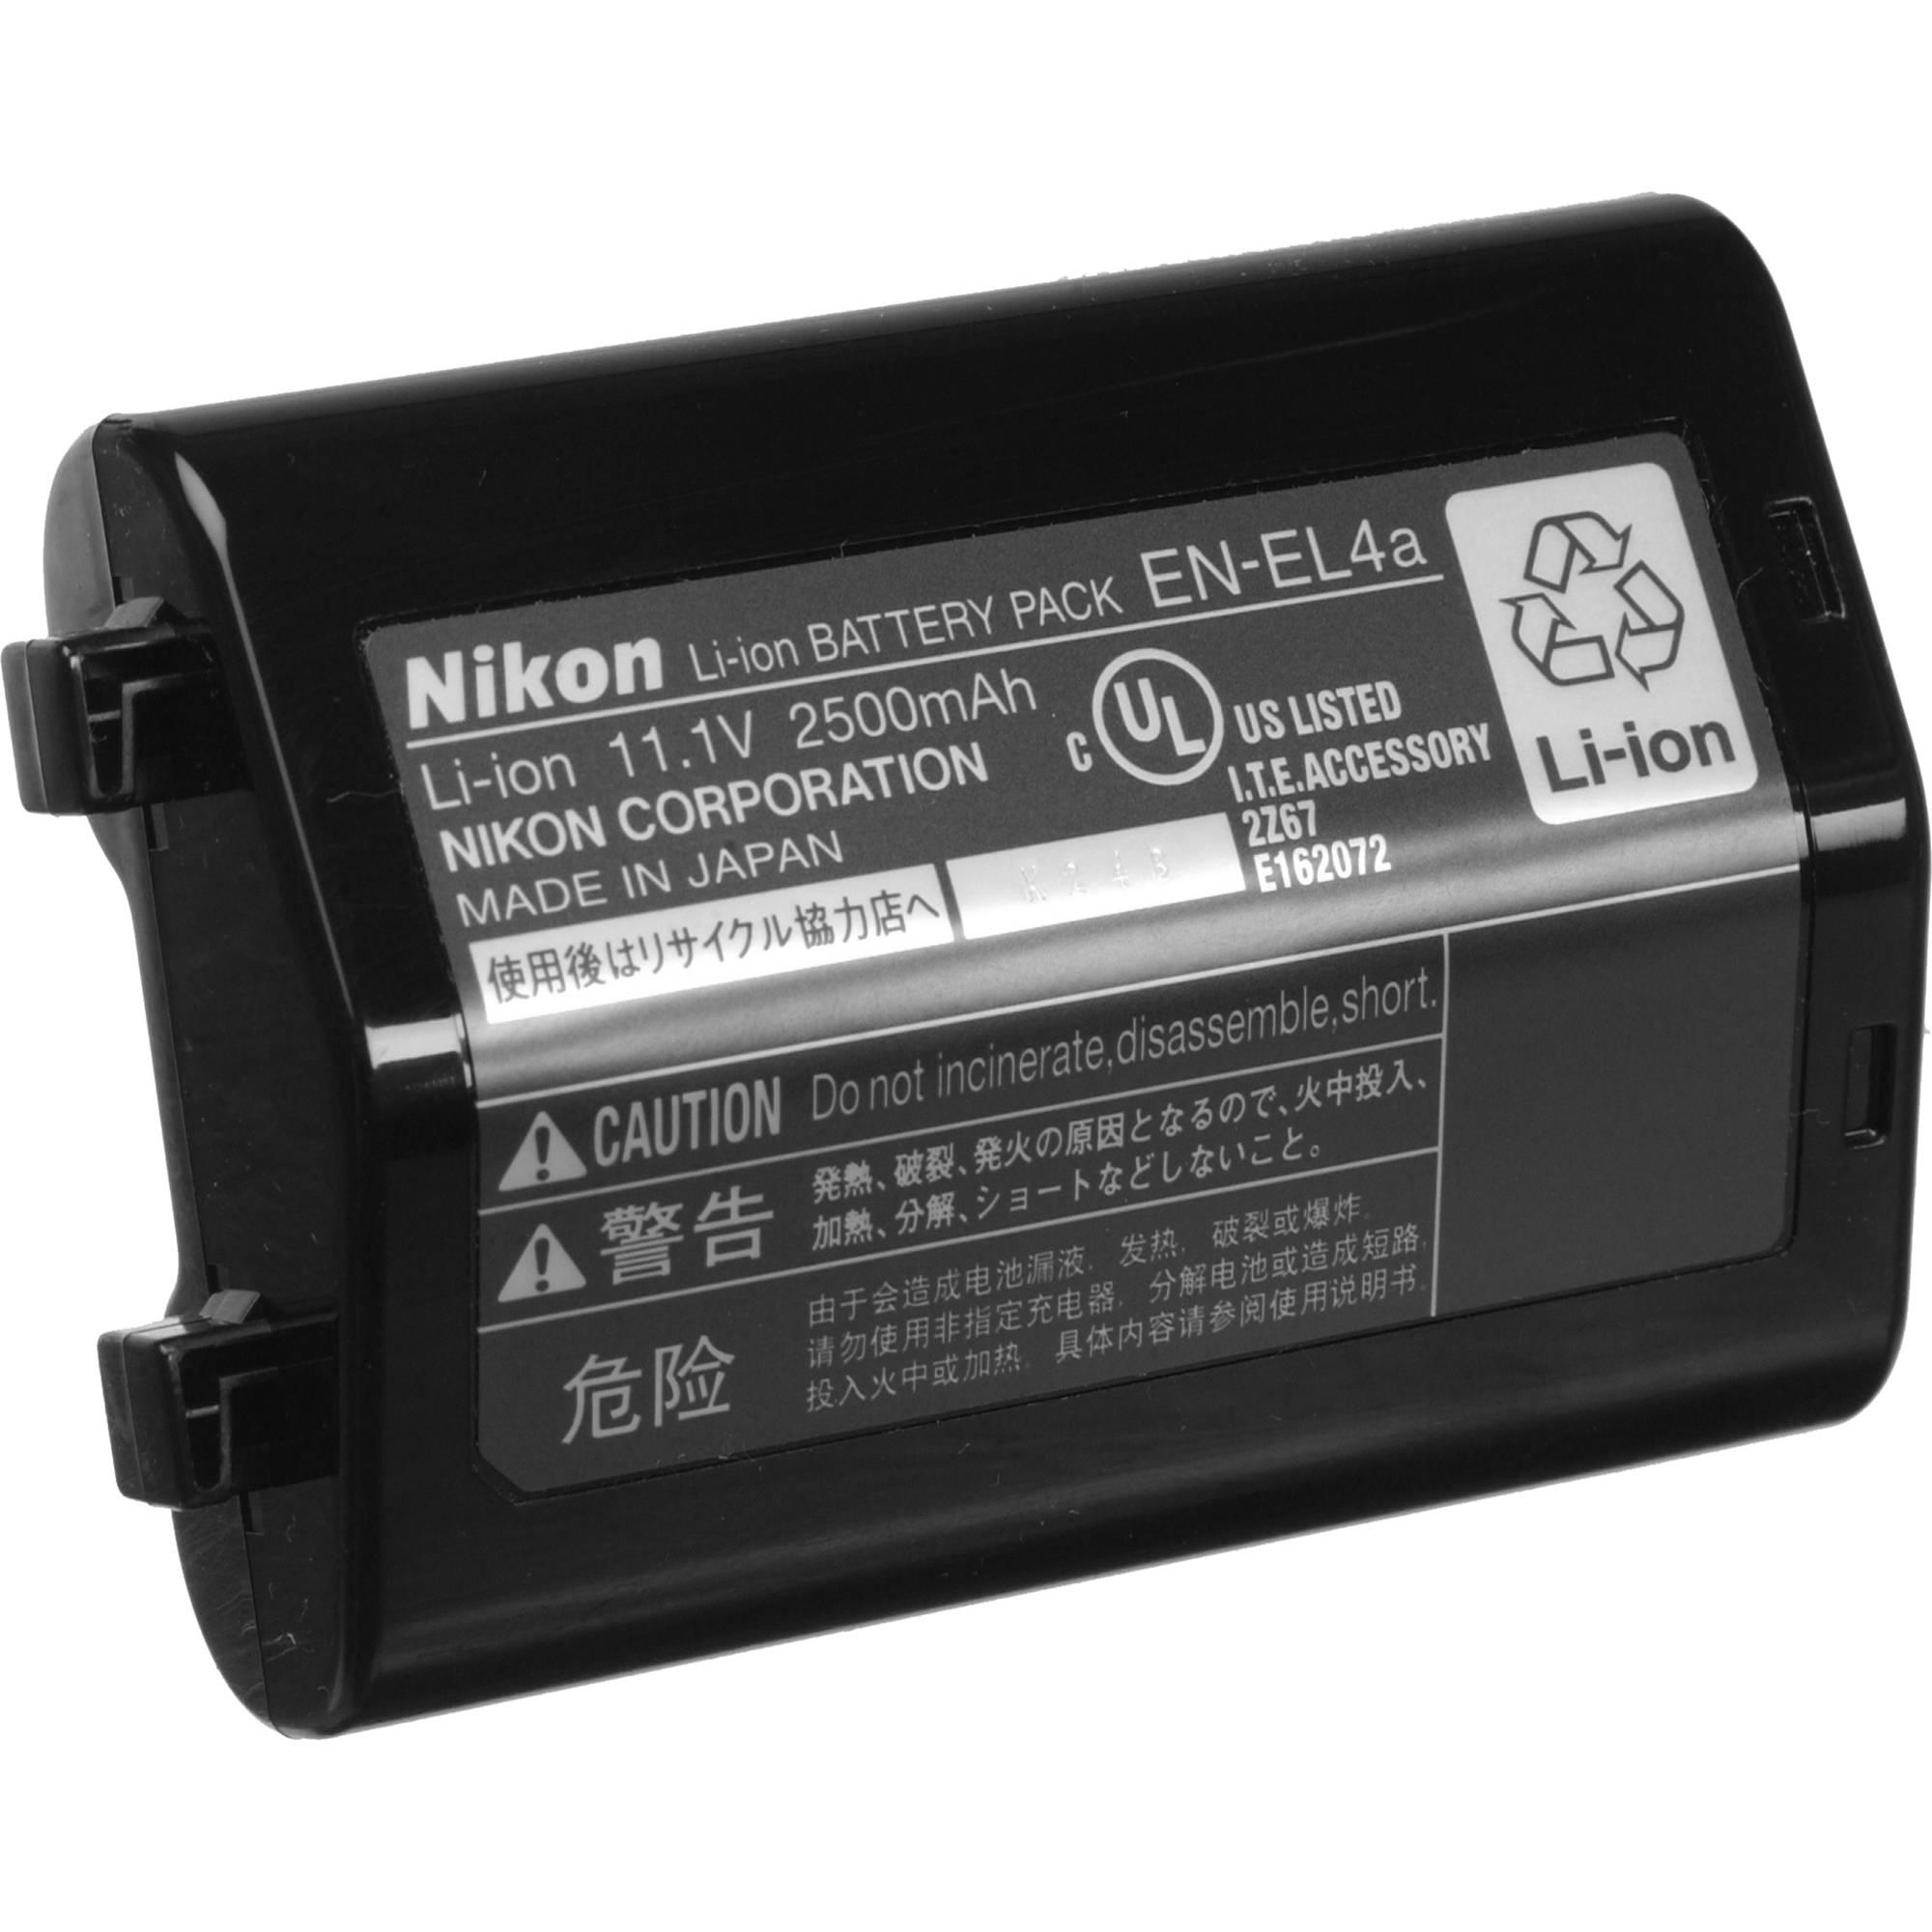 Nikon EN-EL4a Rechargeable Lithium-Ion Battery (11 1v 2450mAh)